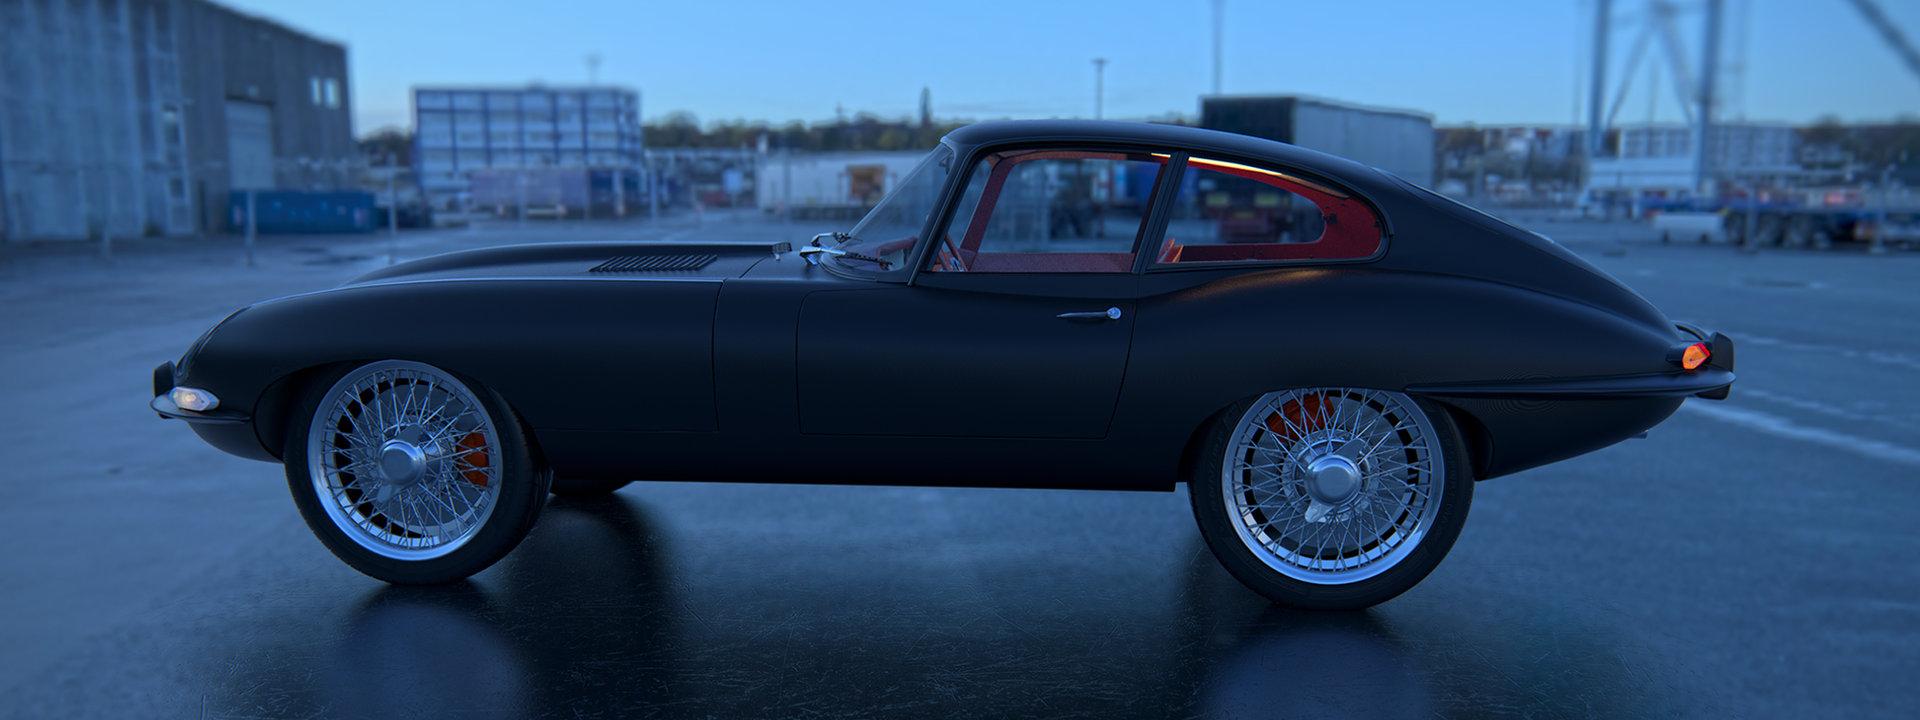 Michael marcondes blkup02 jaguar 1961 e type s1 3